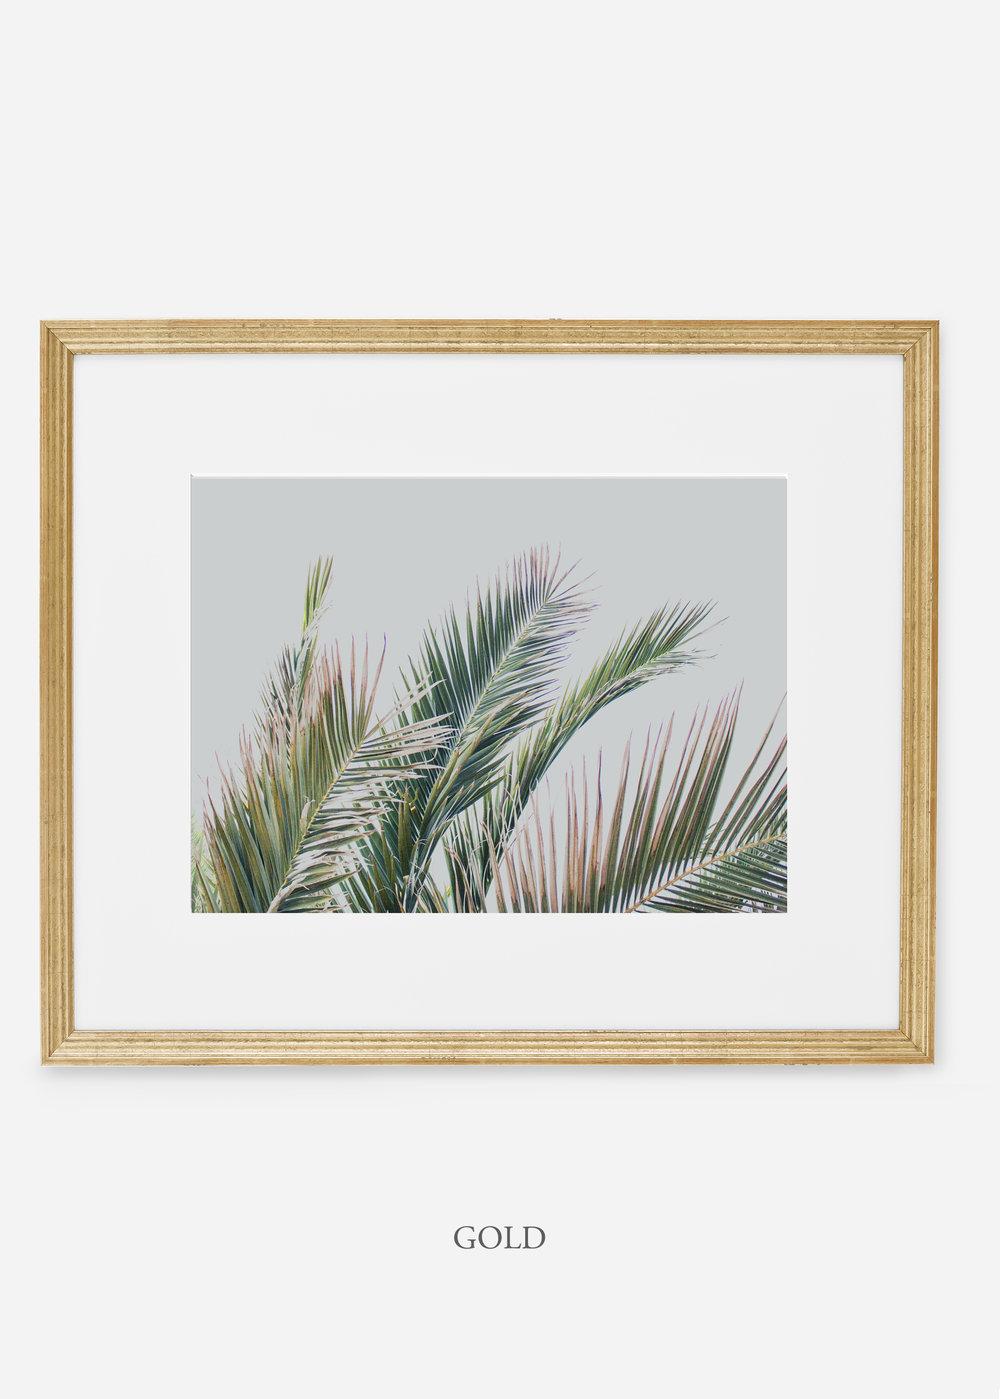 interiordesign_goldframe_art_tropical_palmtree_StormyGrayPalm.jpg